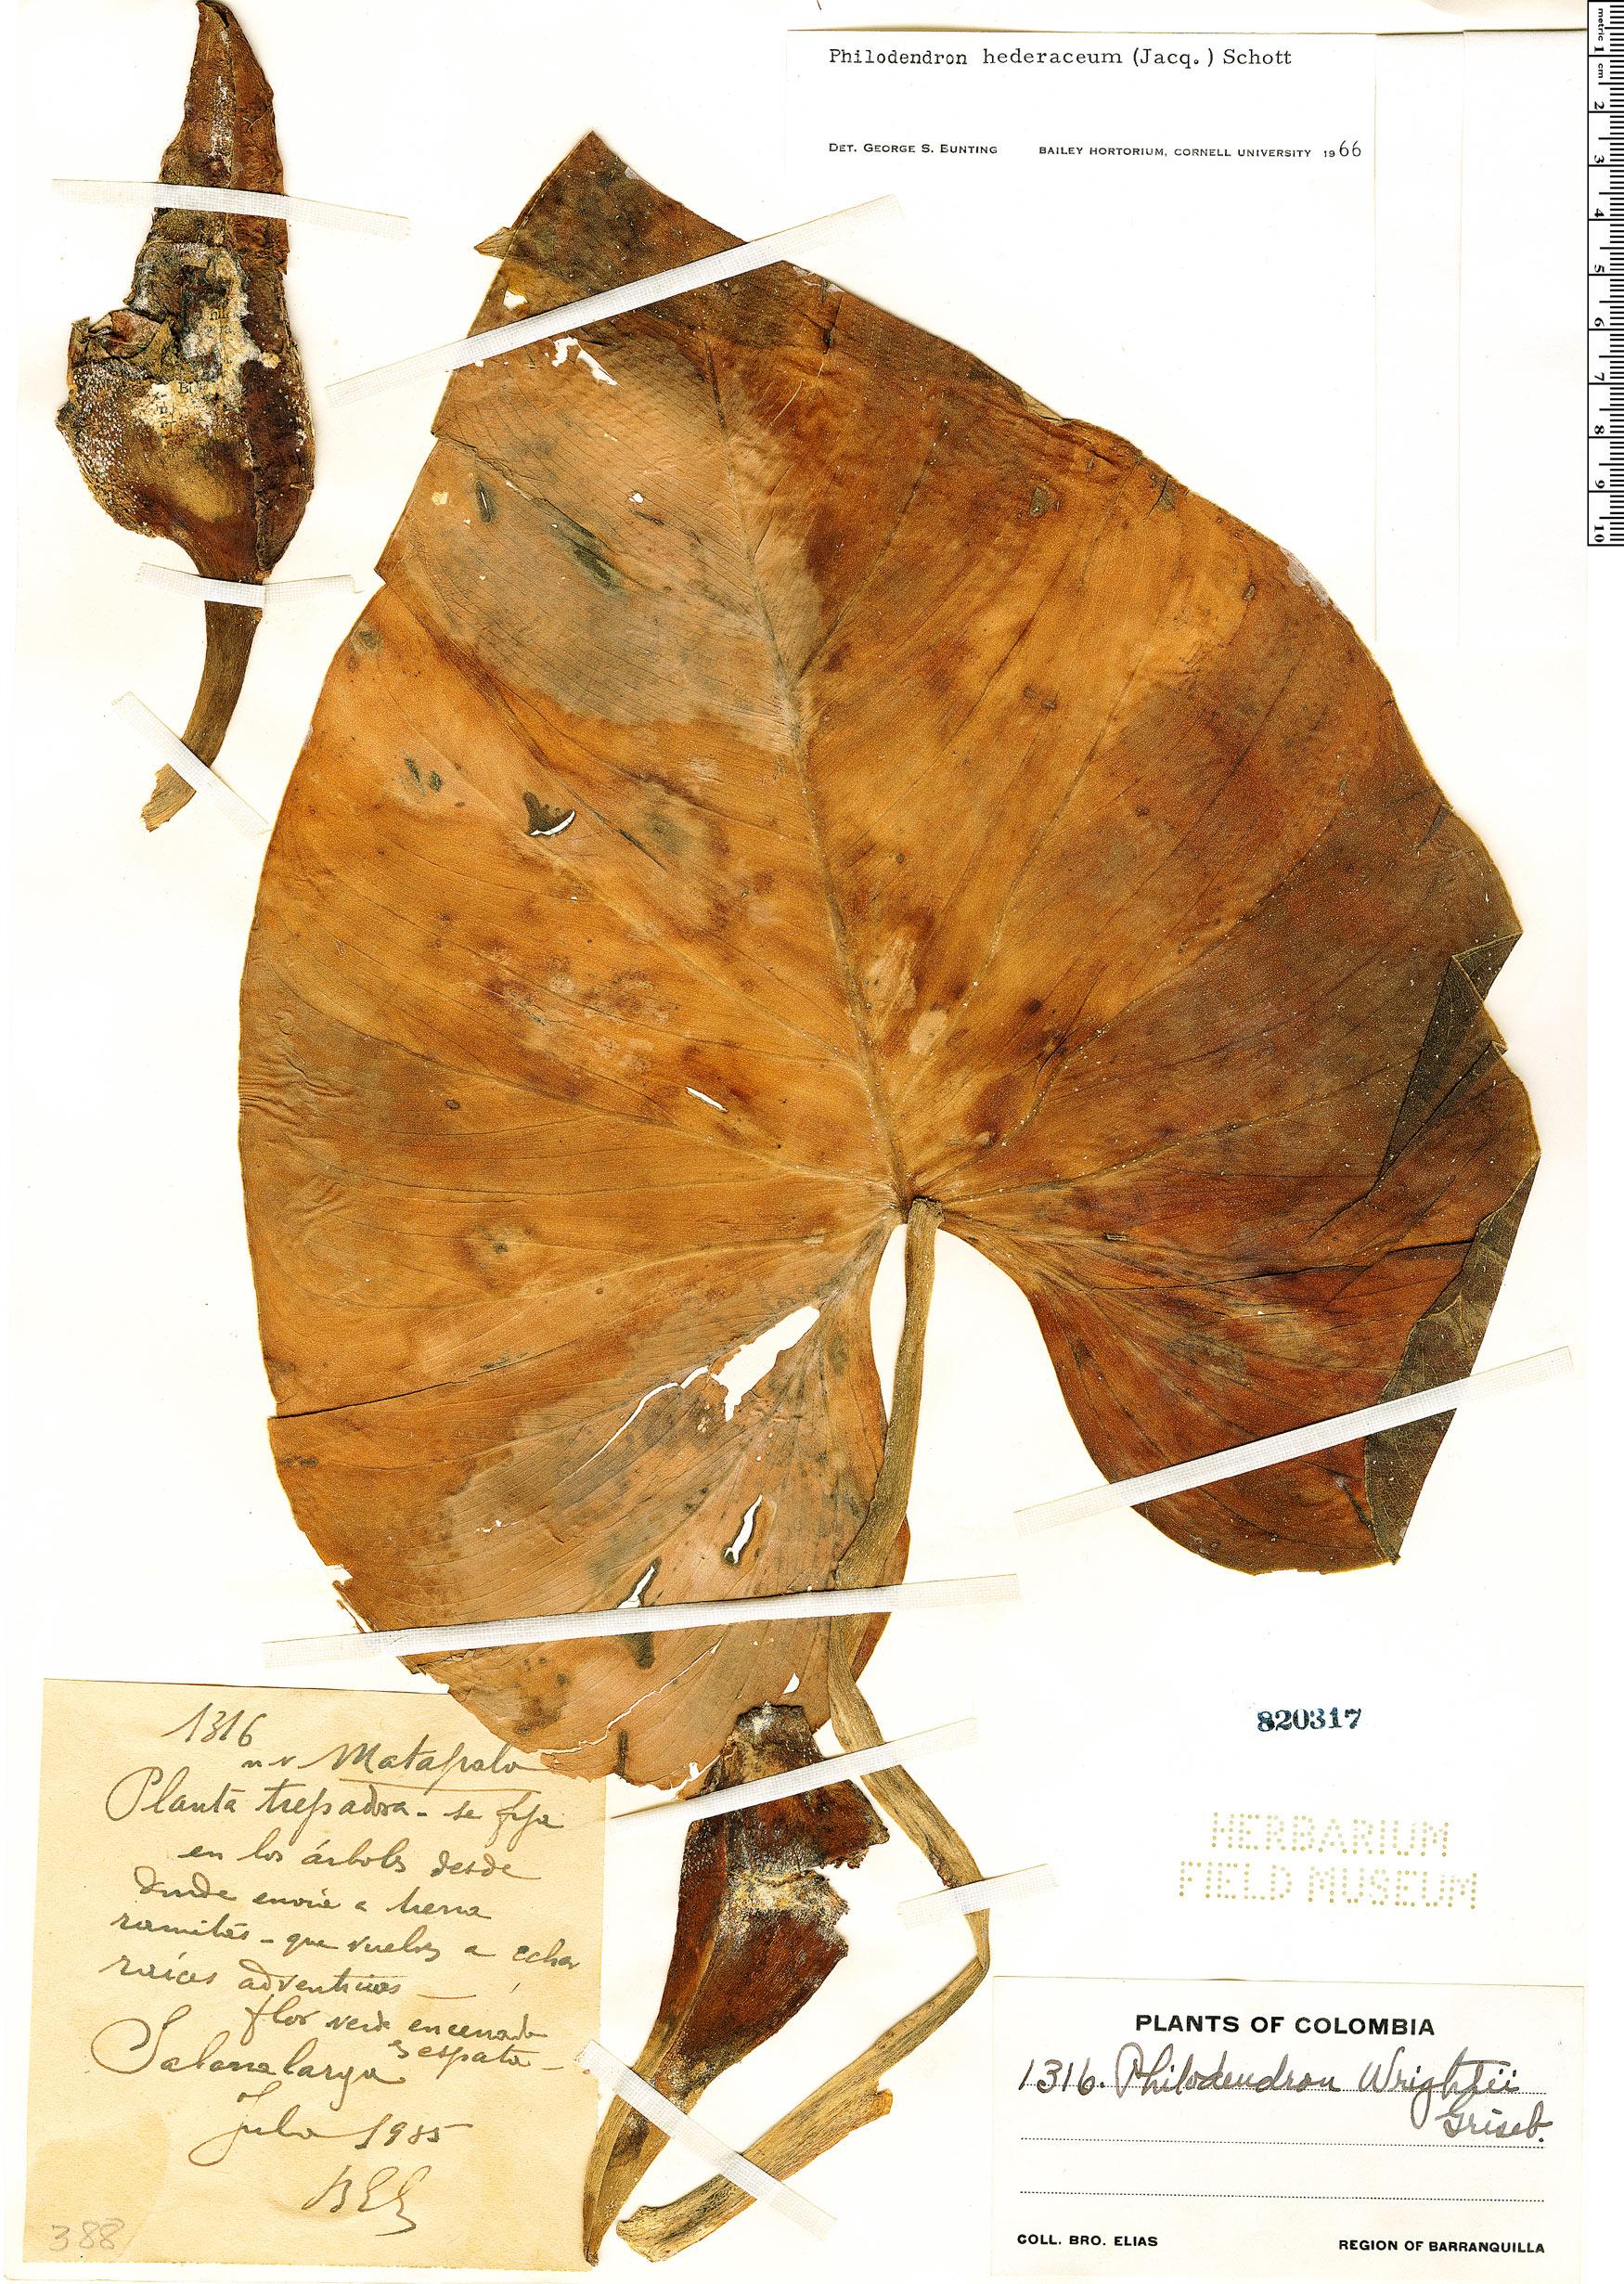 Specimen: Philodendron hederaceum